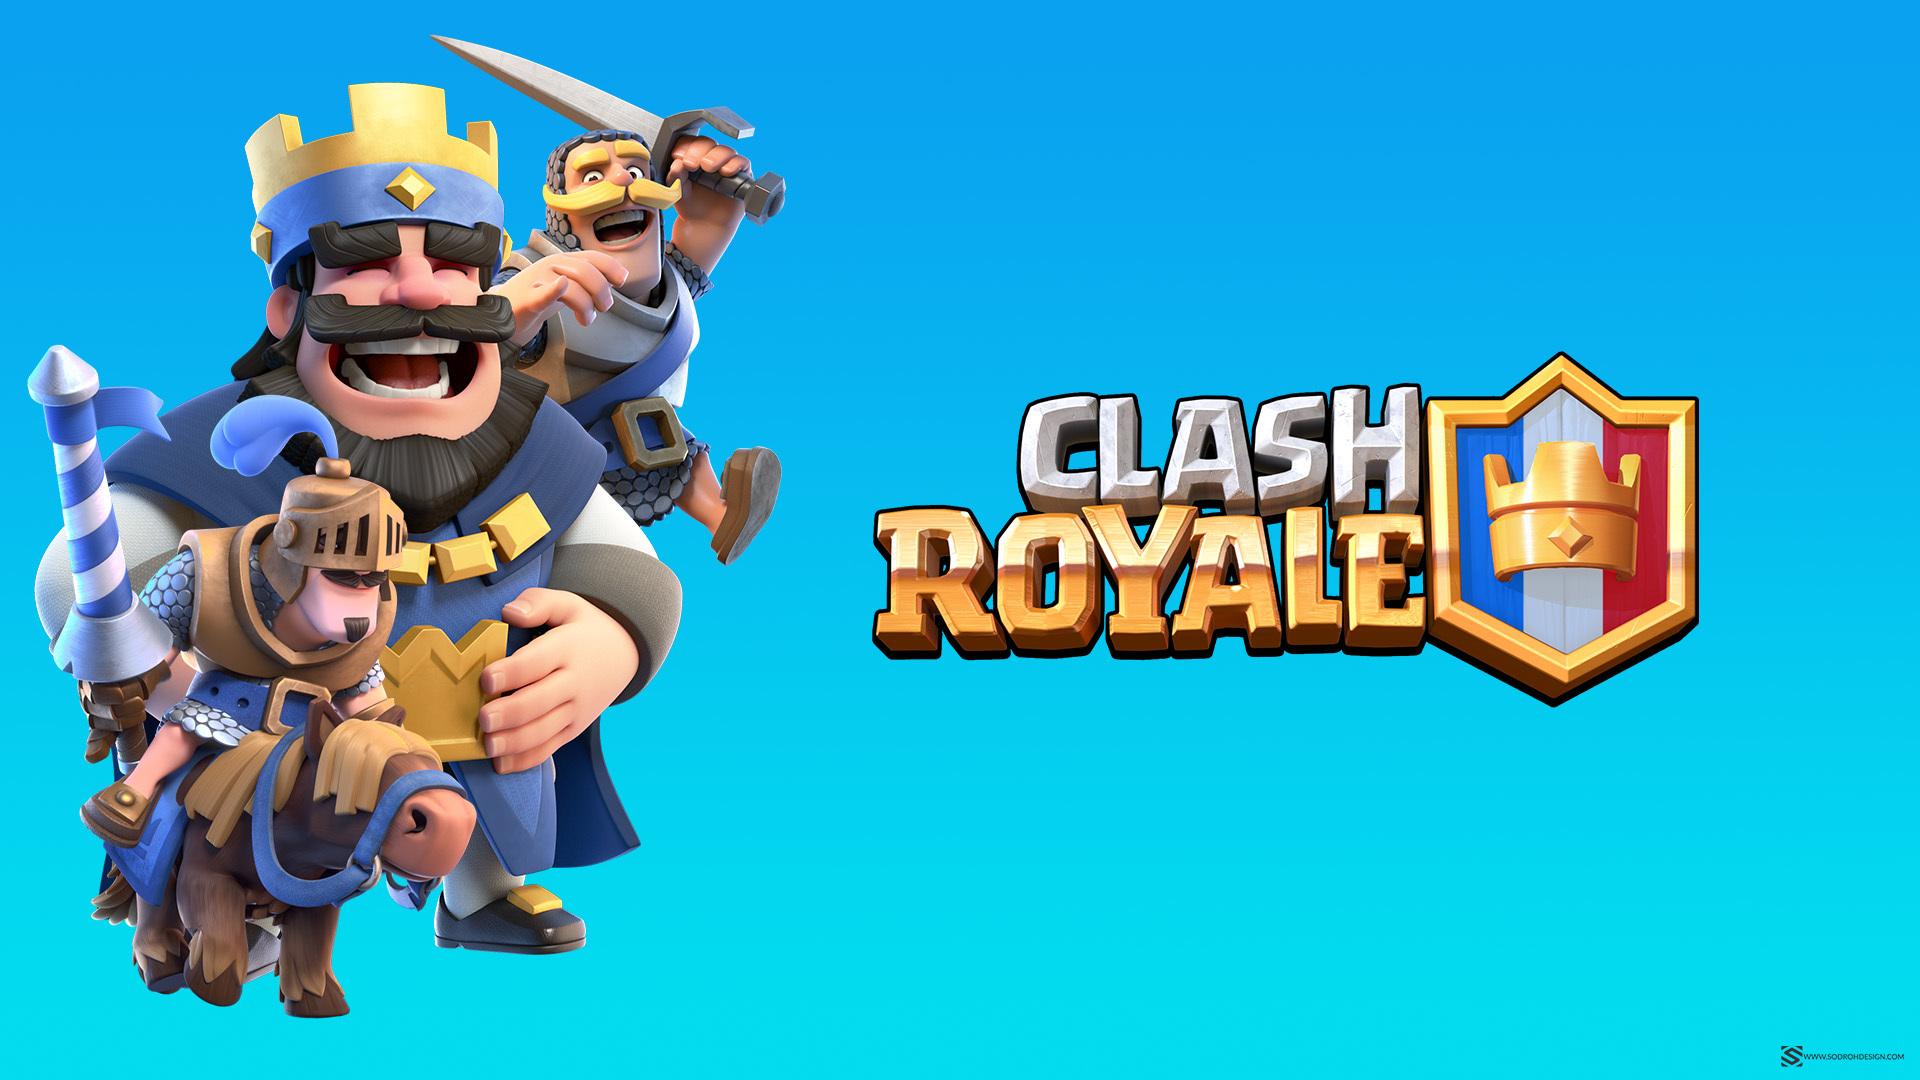 2048x1152 Clash Royale Desktop 2048x1152 Resolution Hd 4k